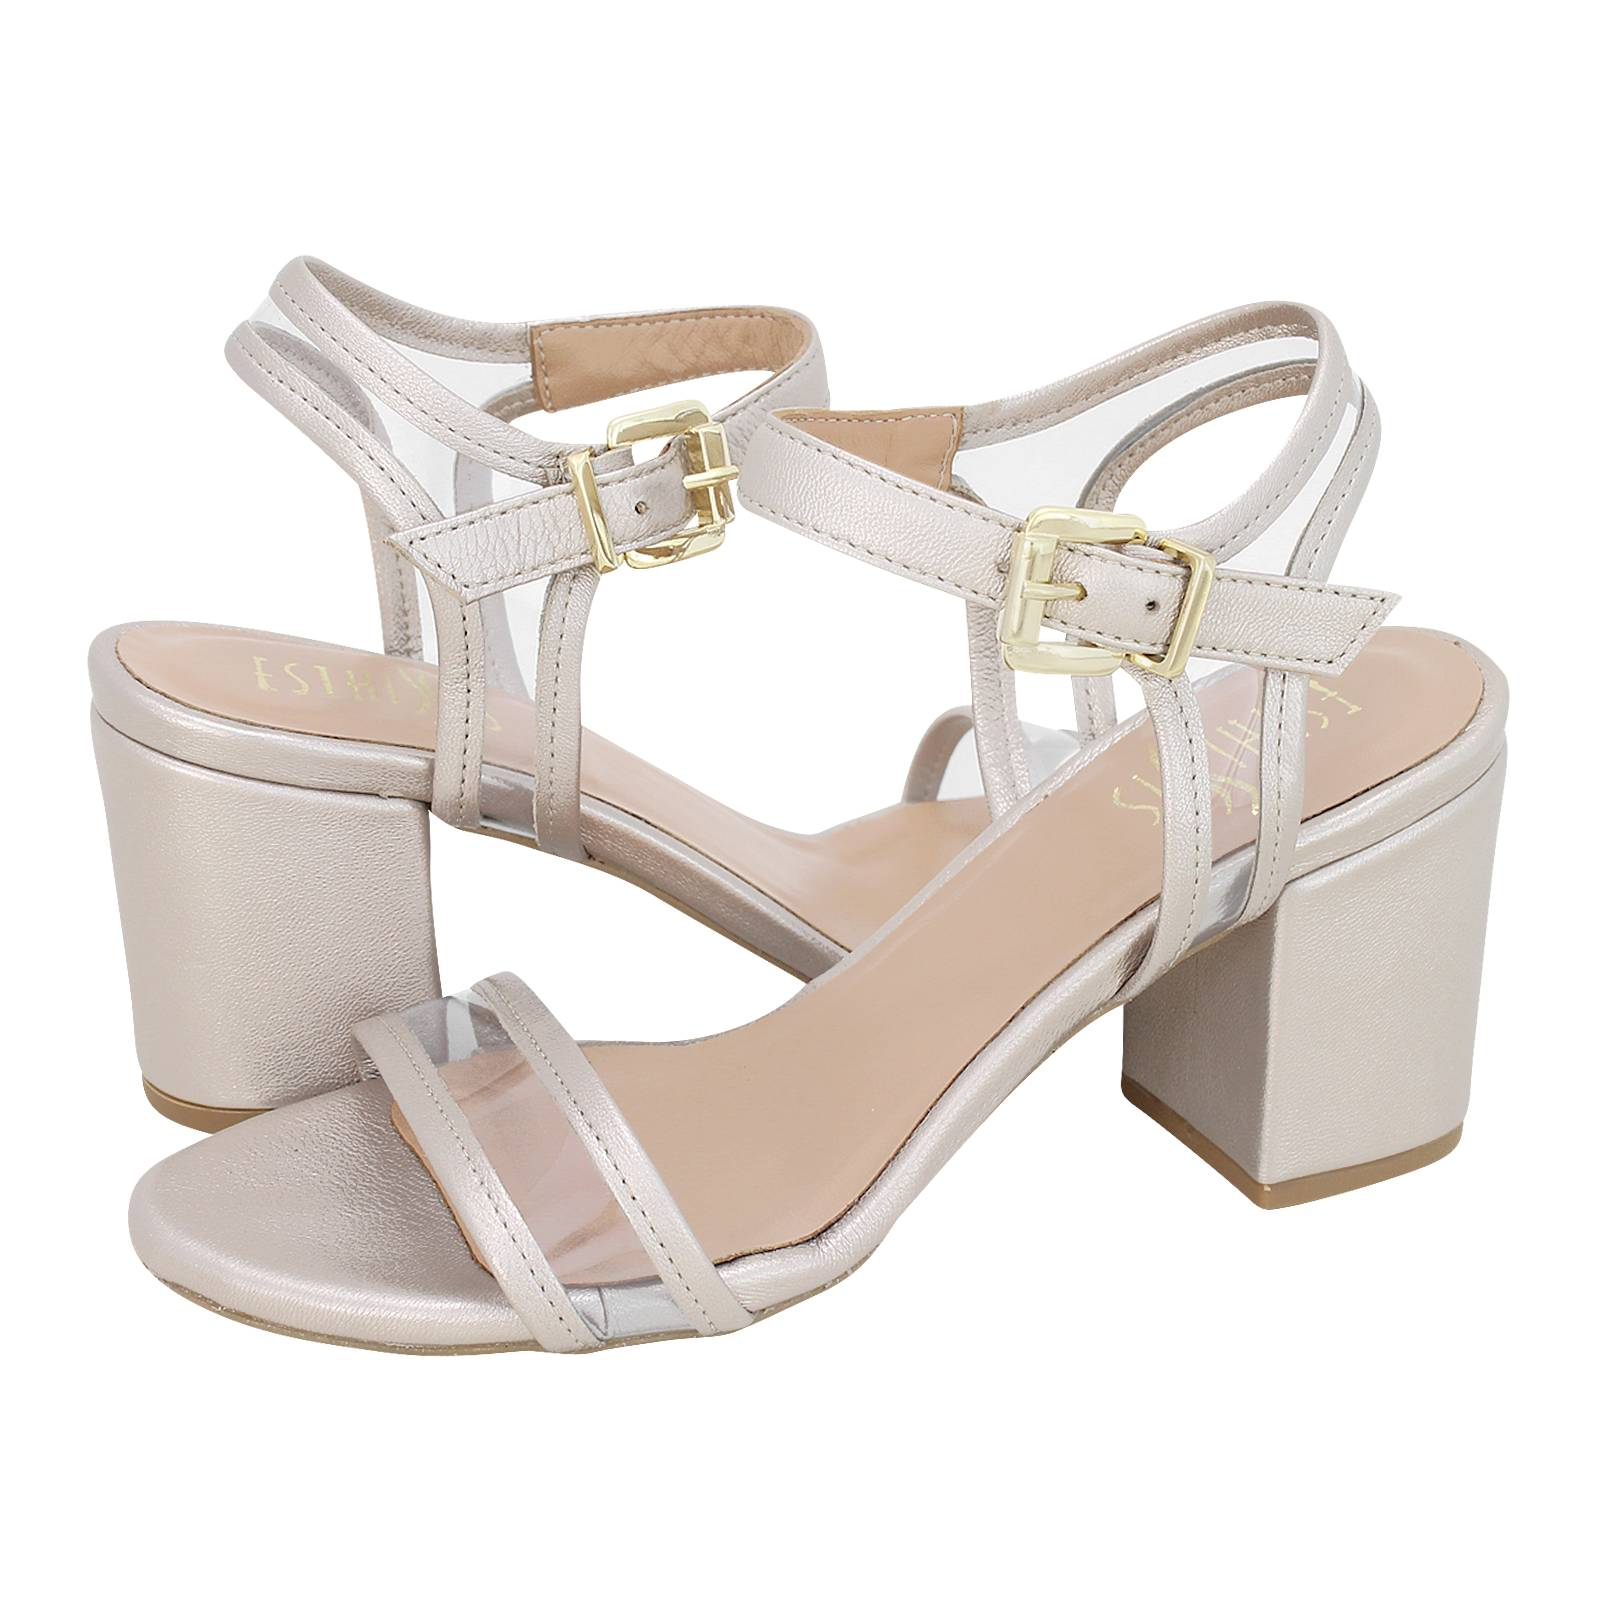 Sonnino - Esthissis Women s sandals made of metallic leather ... fa1800c3e0f